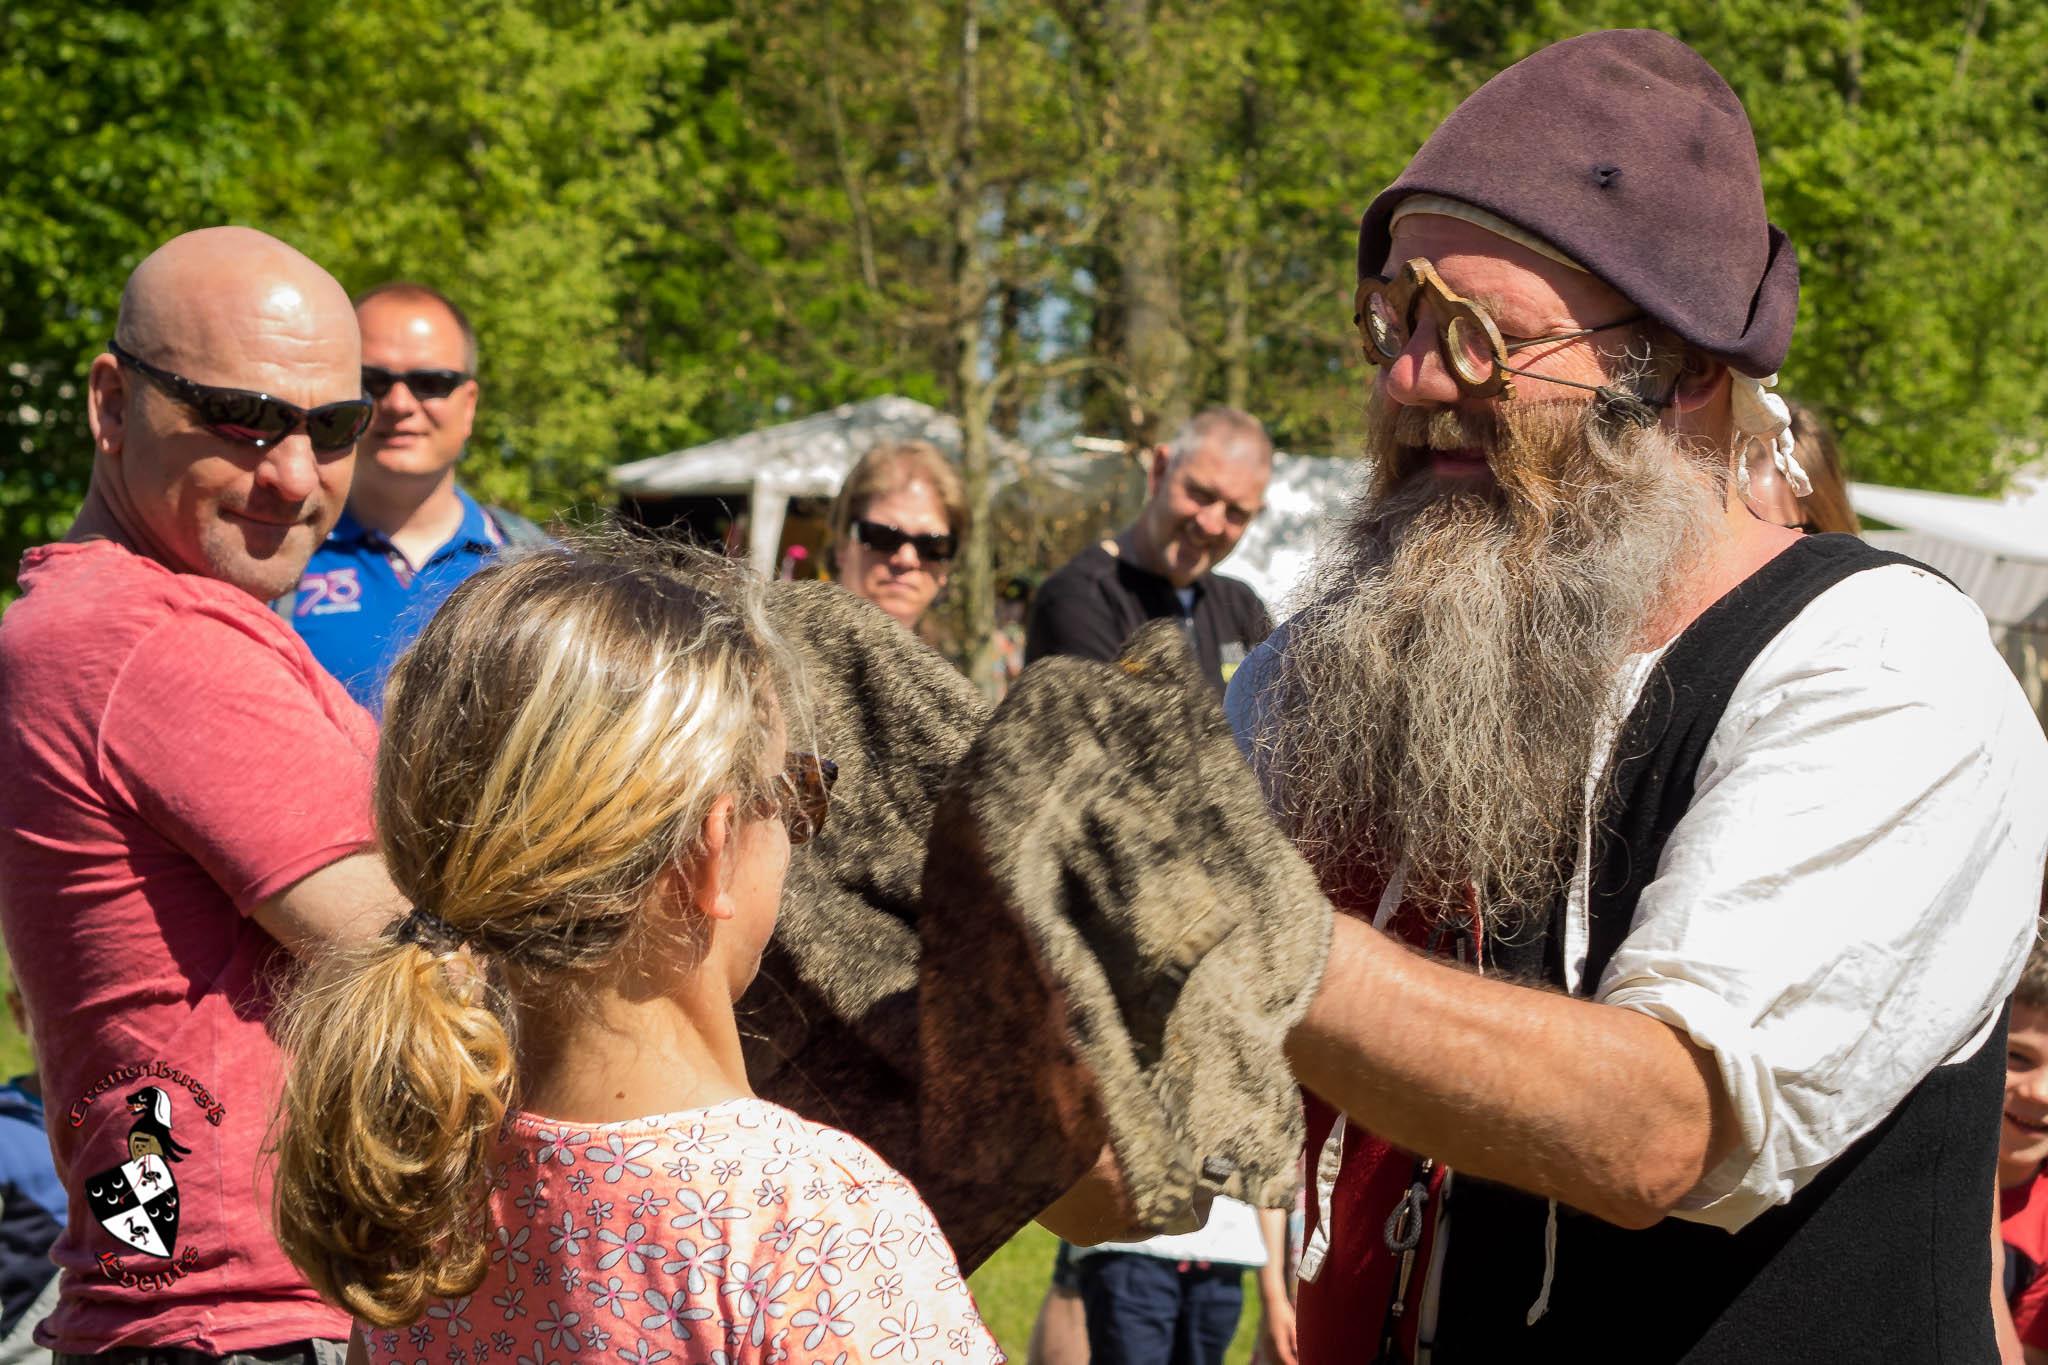 Middeleeuws-Festijn-Cannenburgh-2018-Algemeen-Ellen-la-Faille-22